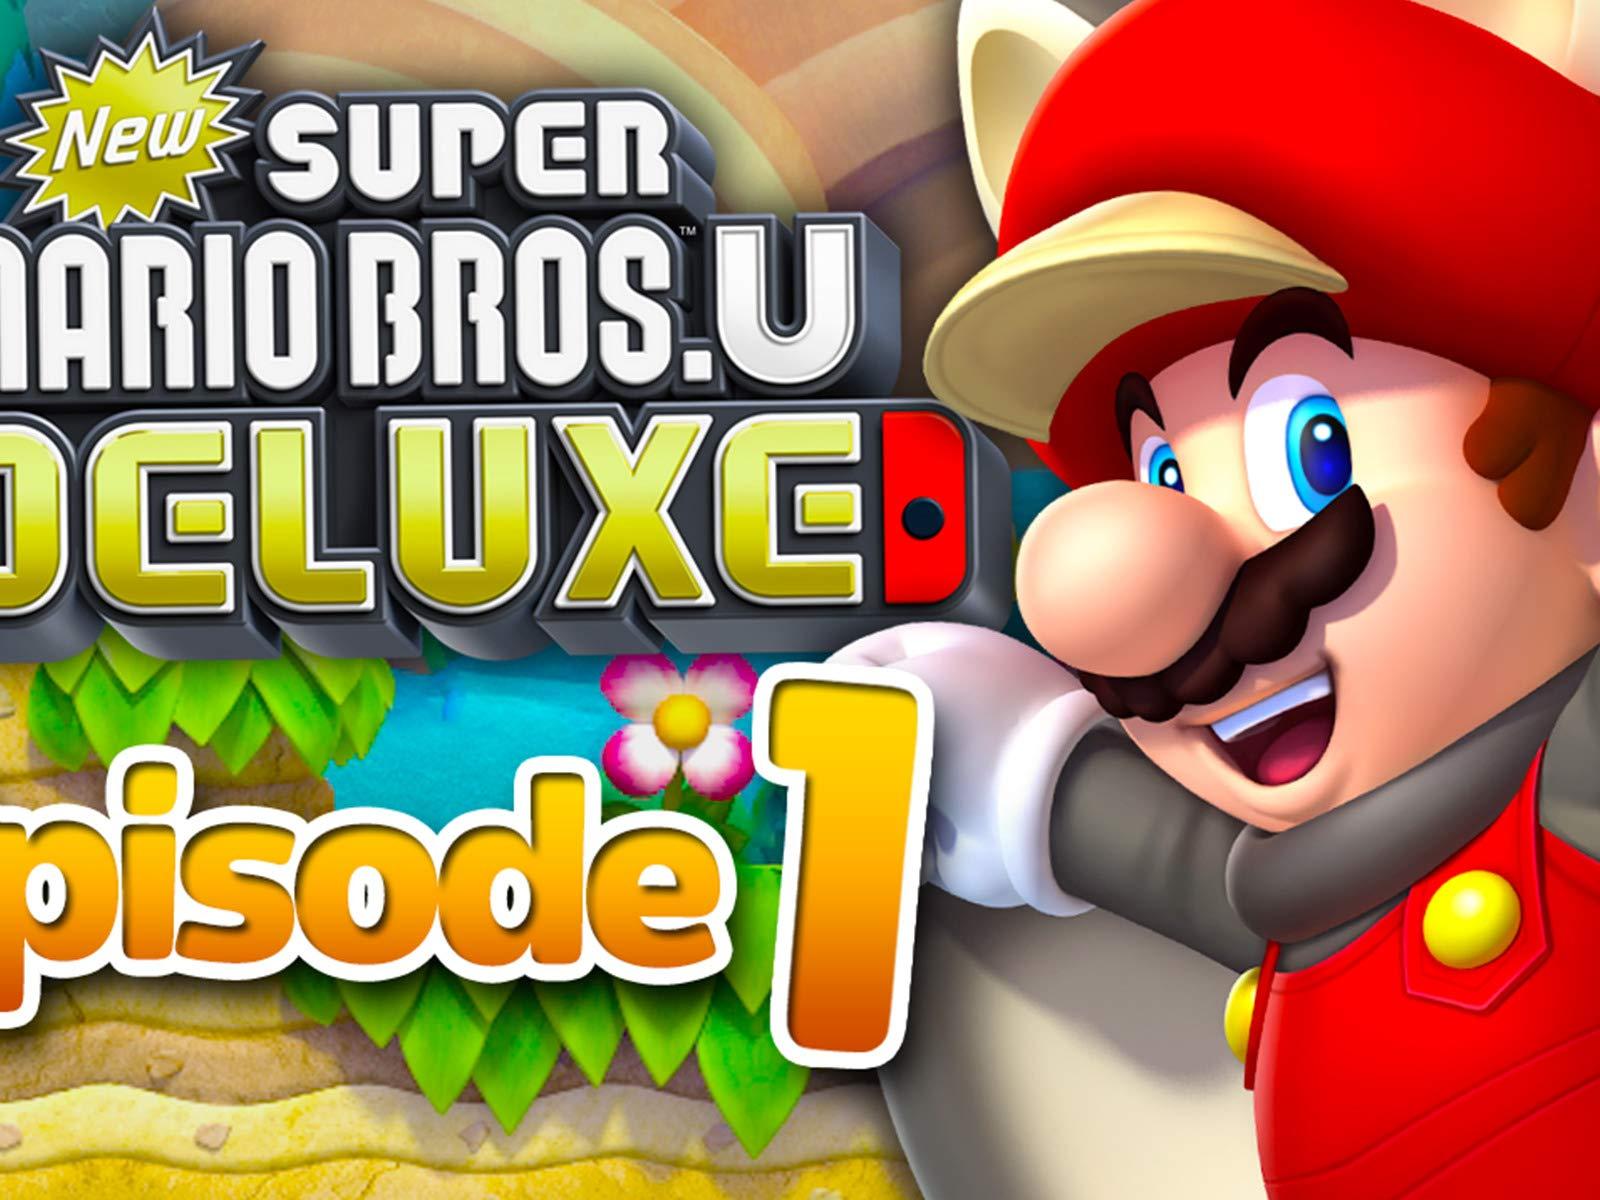 Clip: New Super Mario Bros. U Deluxe Gameplay - Zebra Gamer - Season 1